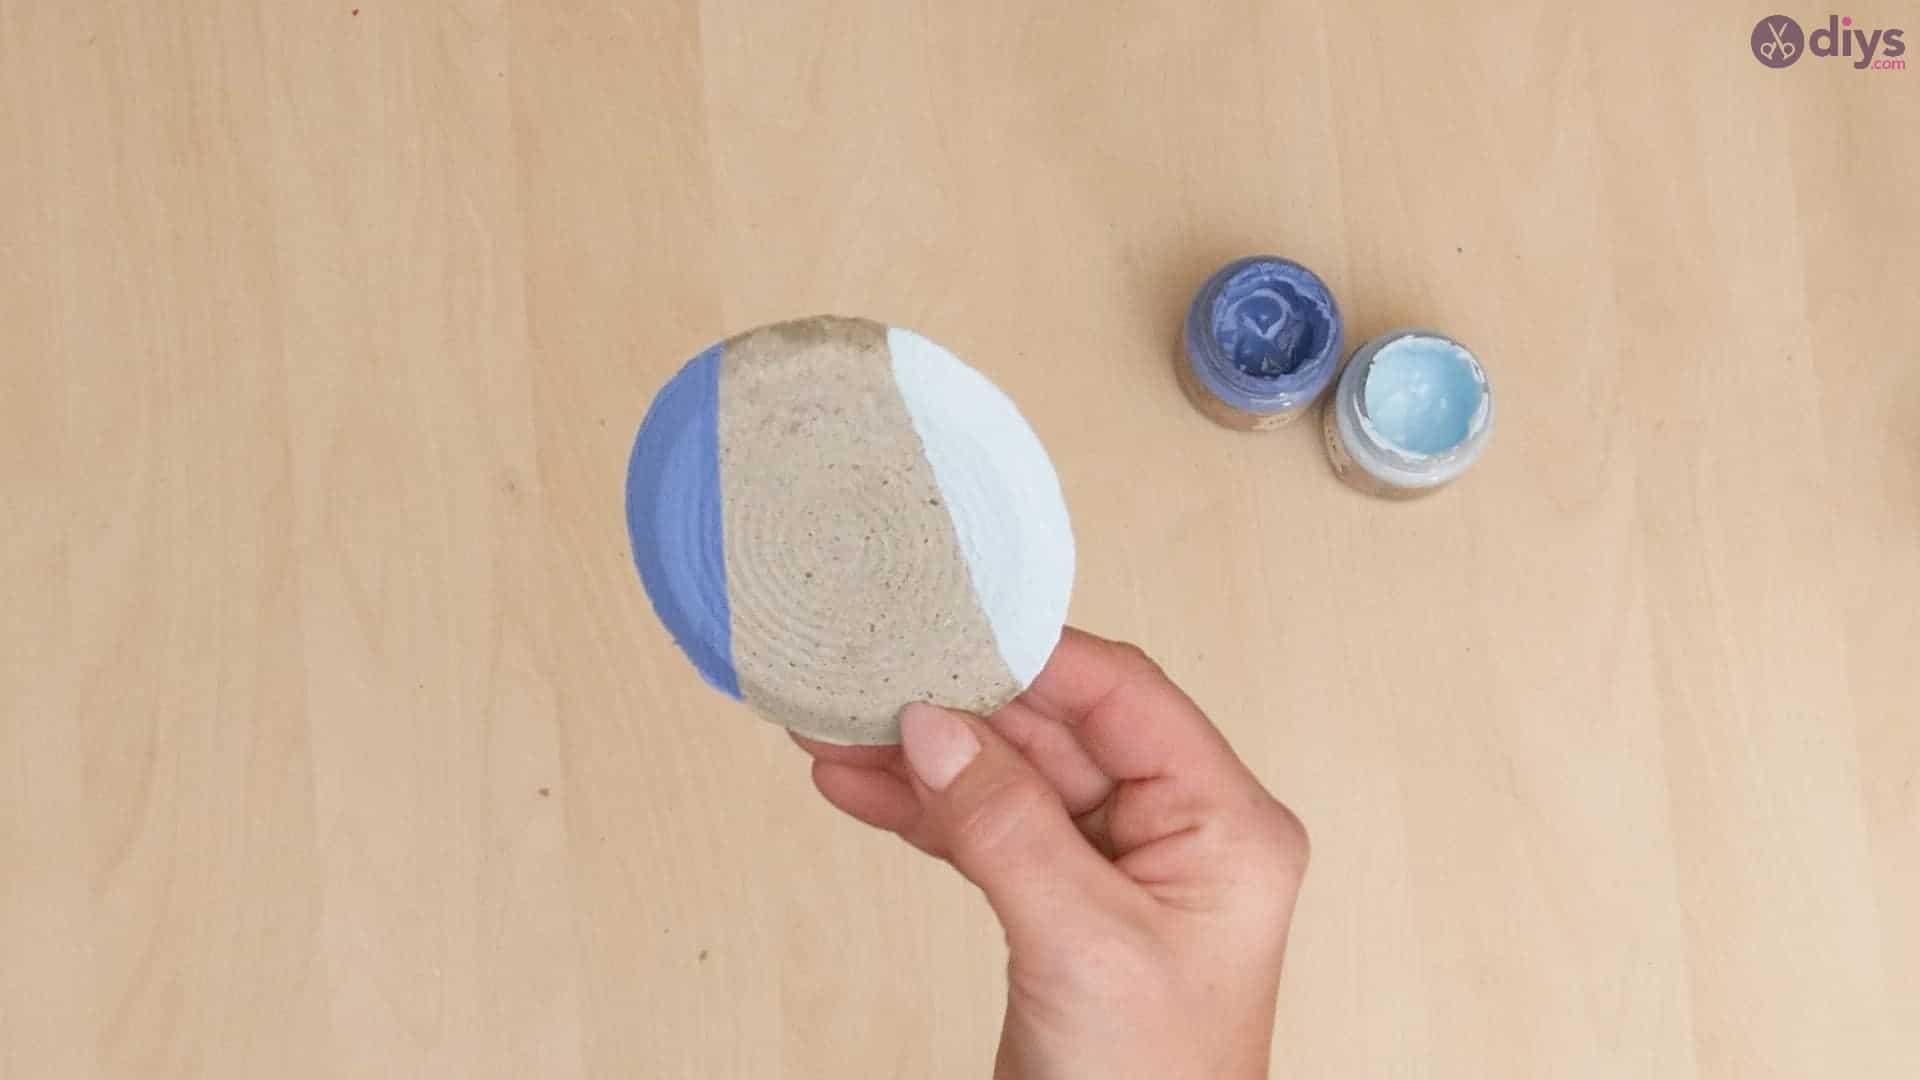 Diy concrete cup holder step 6c